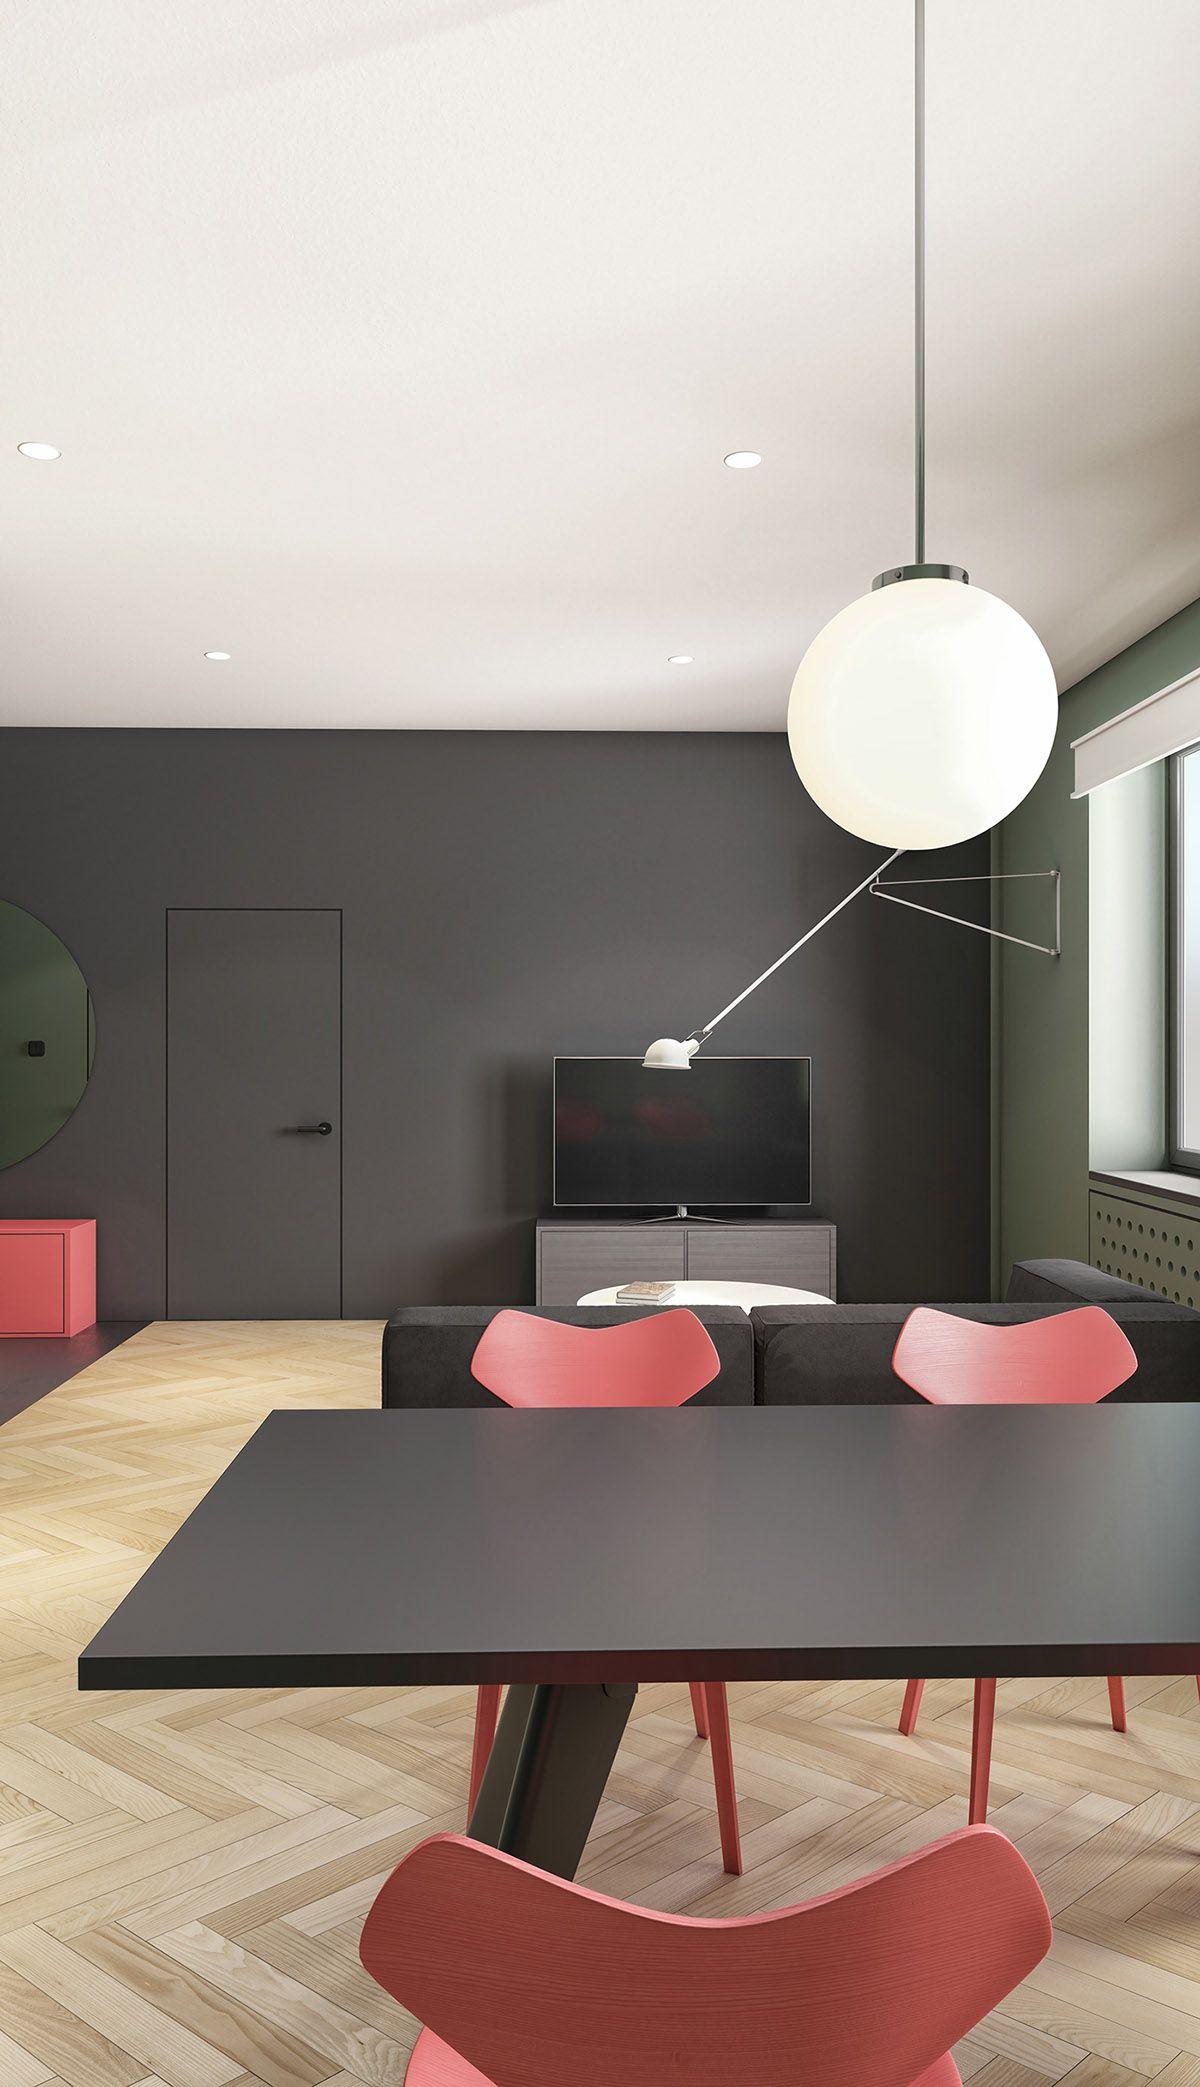 Modern Minimalist Apartment Designs Under 75 Square Meters (808 Square Feet)